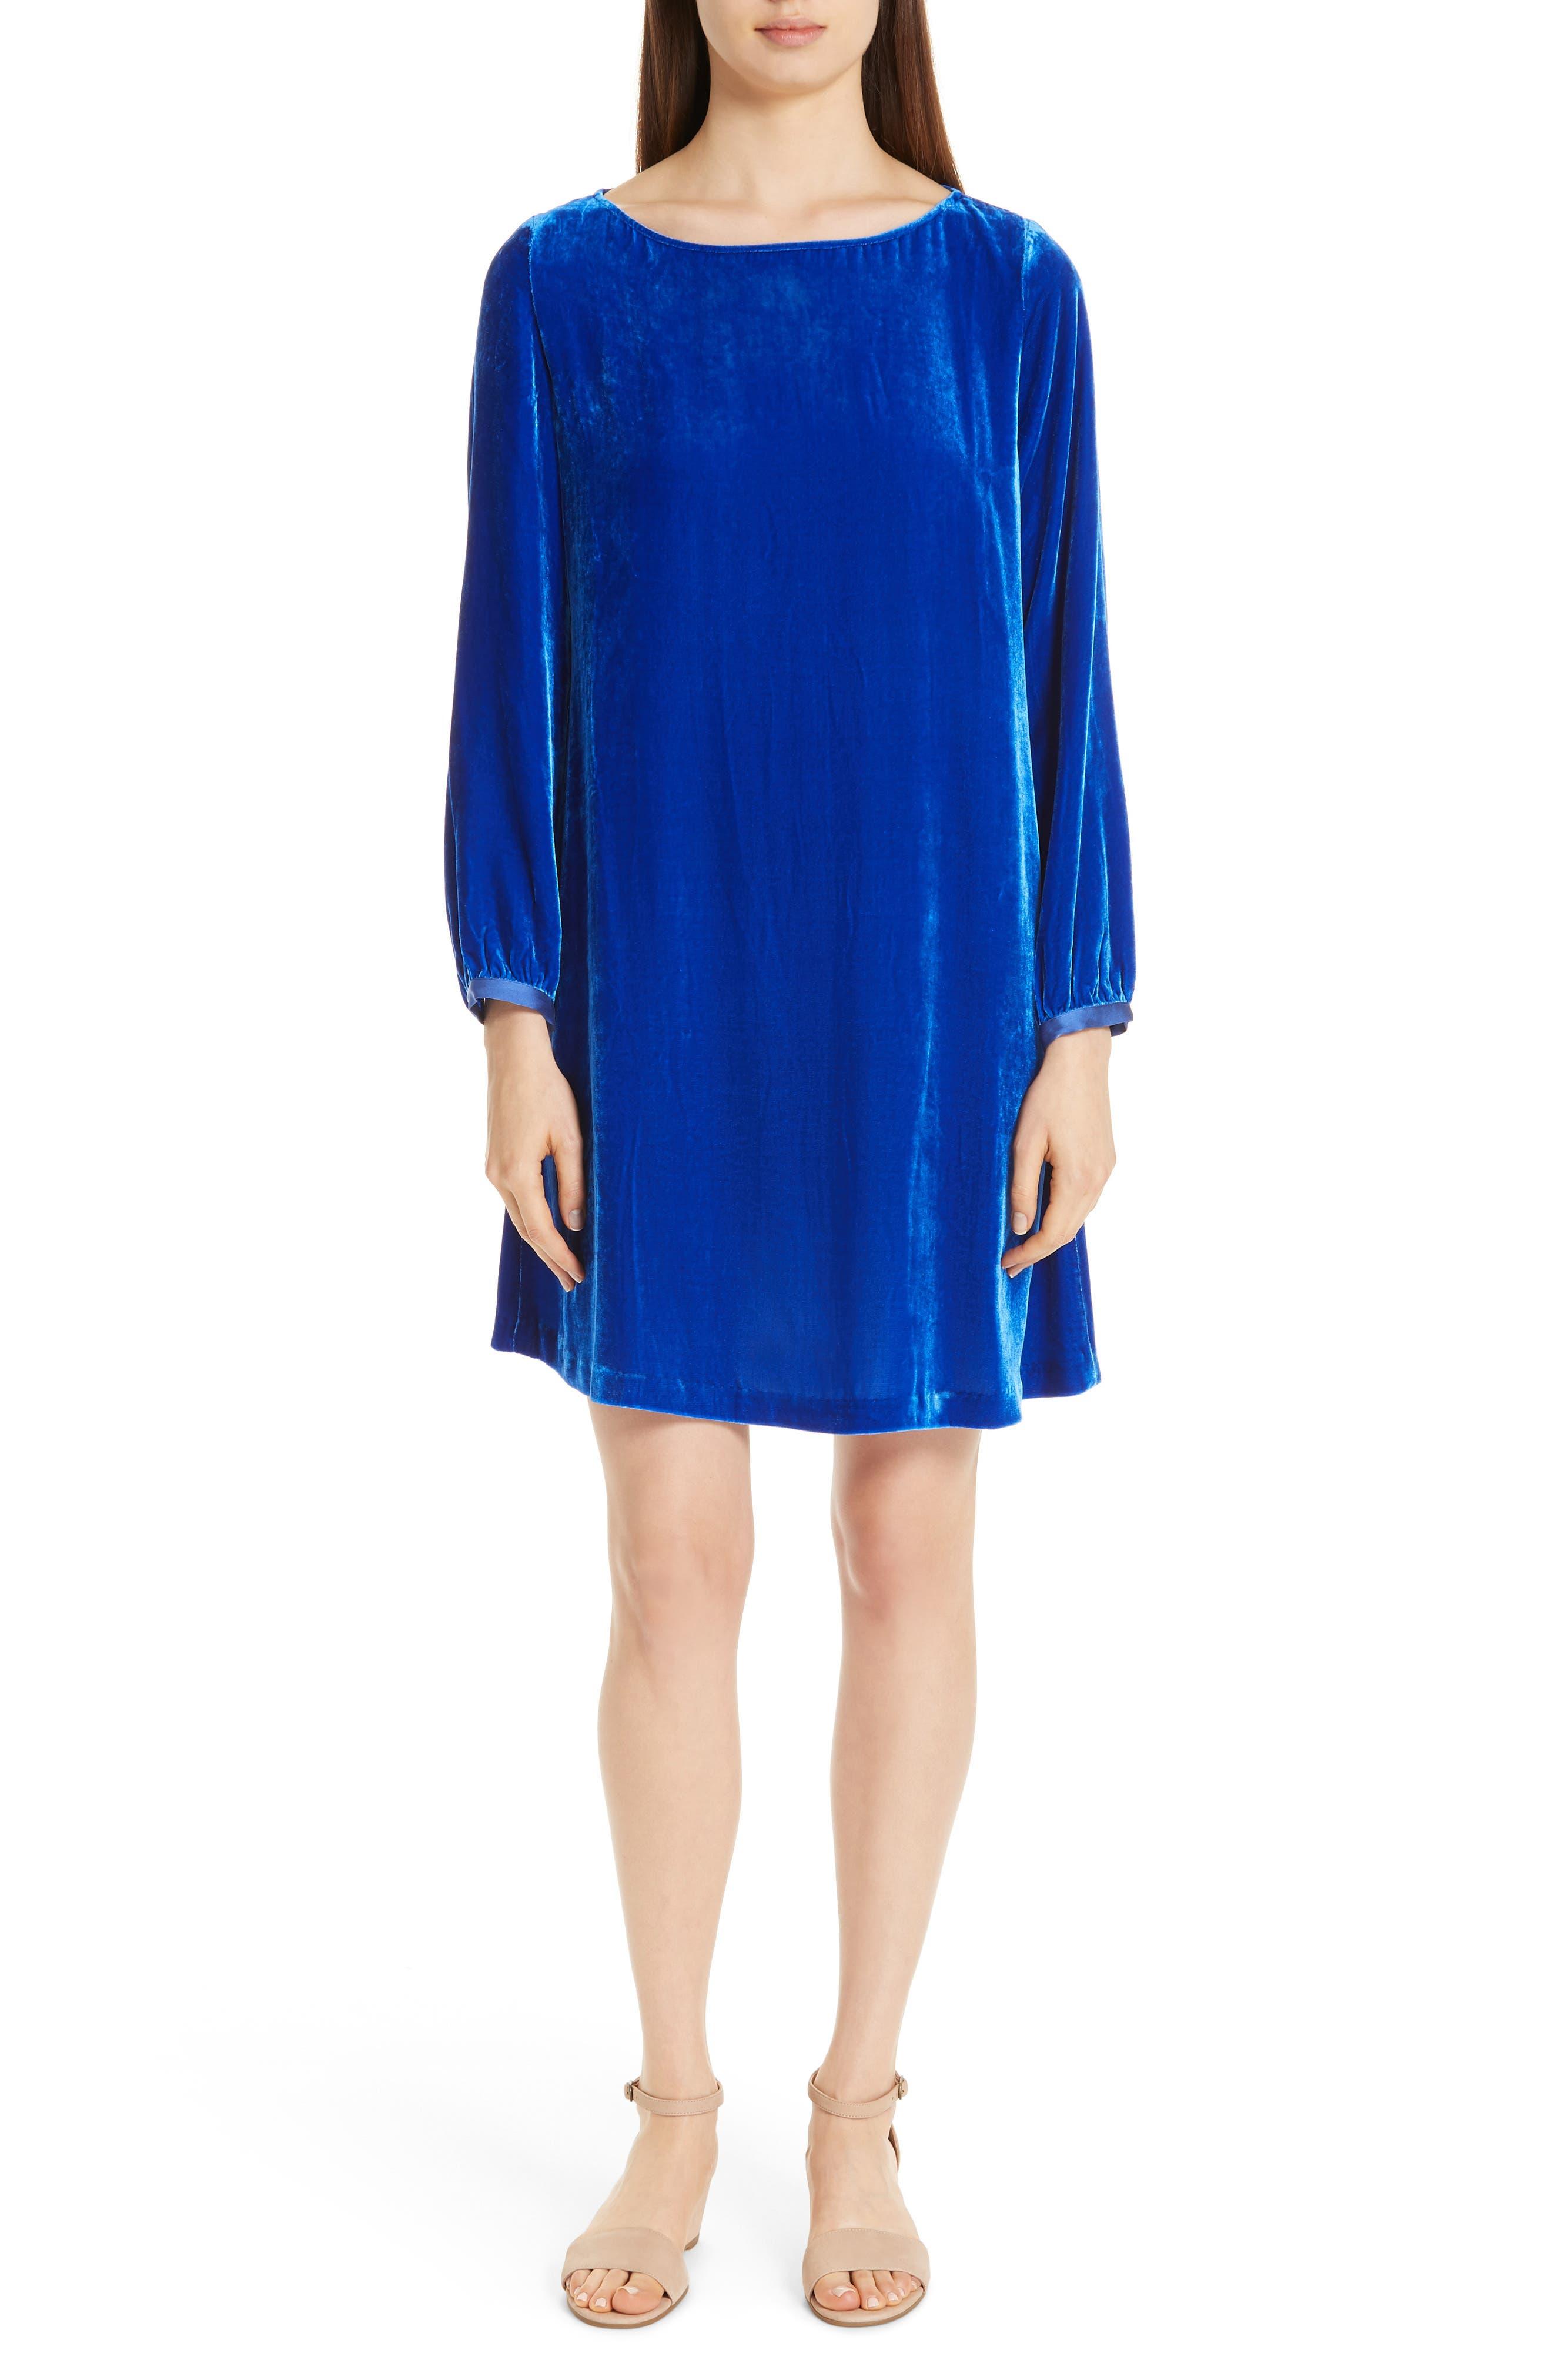 Velvet Bateau-Neck Shift Dress, Petite in Blue